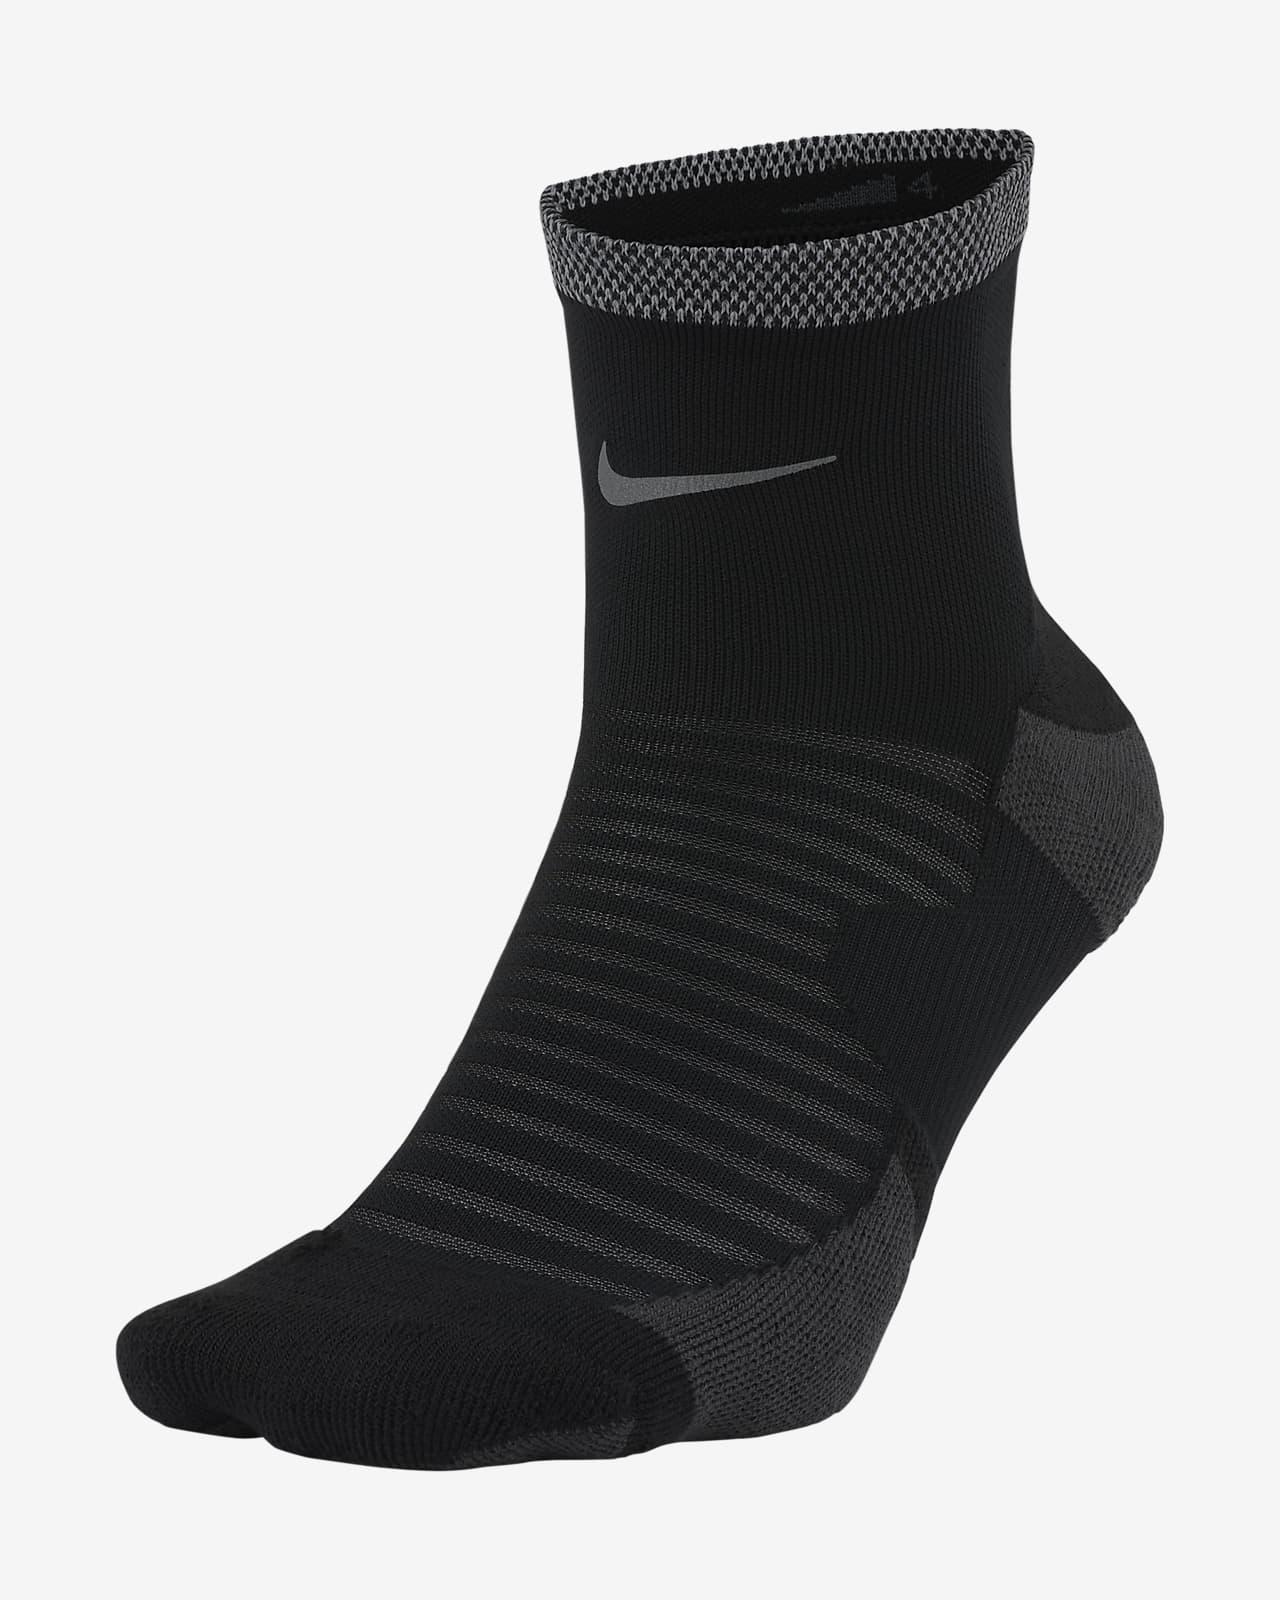 Nike Spark Cushioned Ankle Running Socks